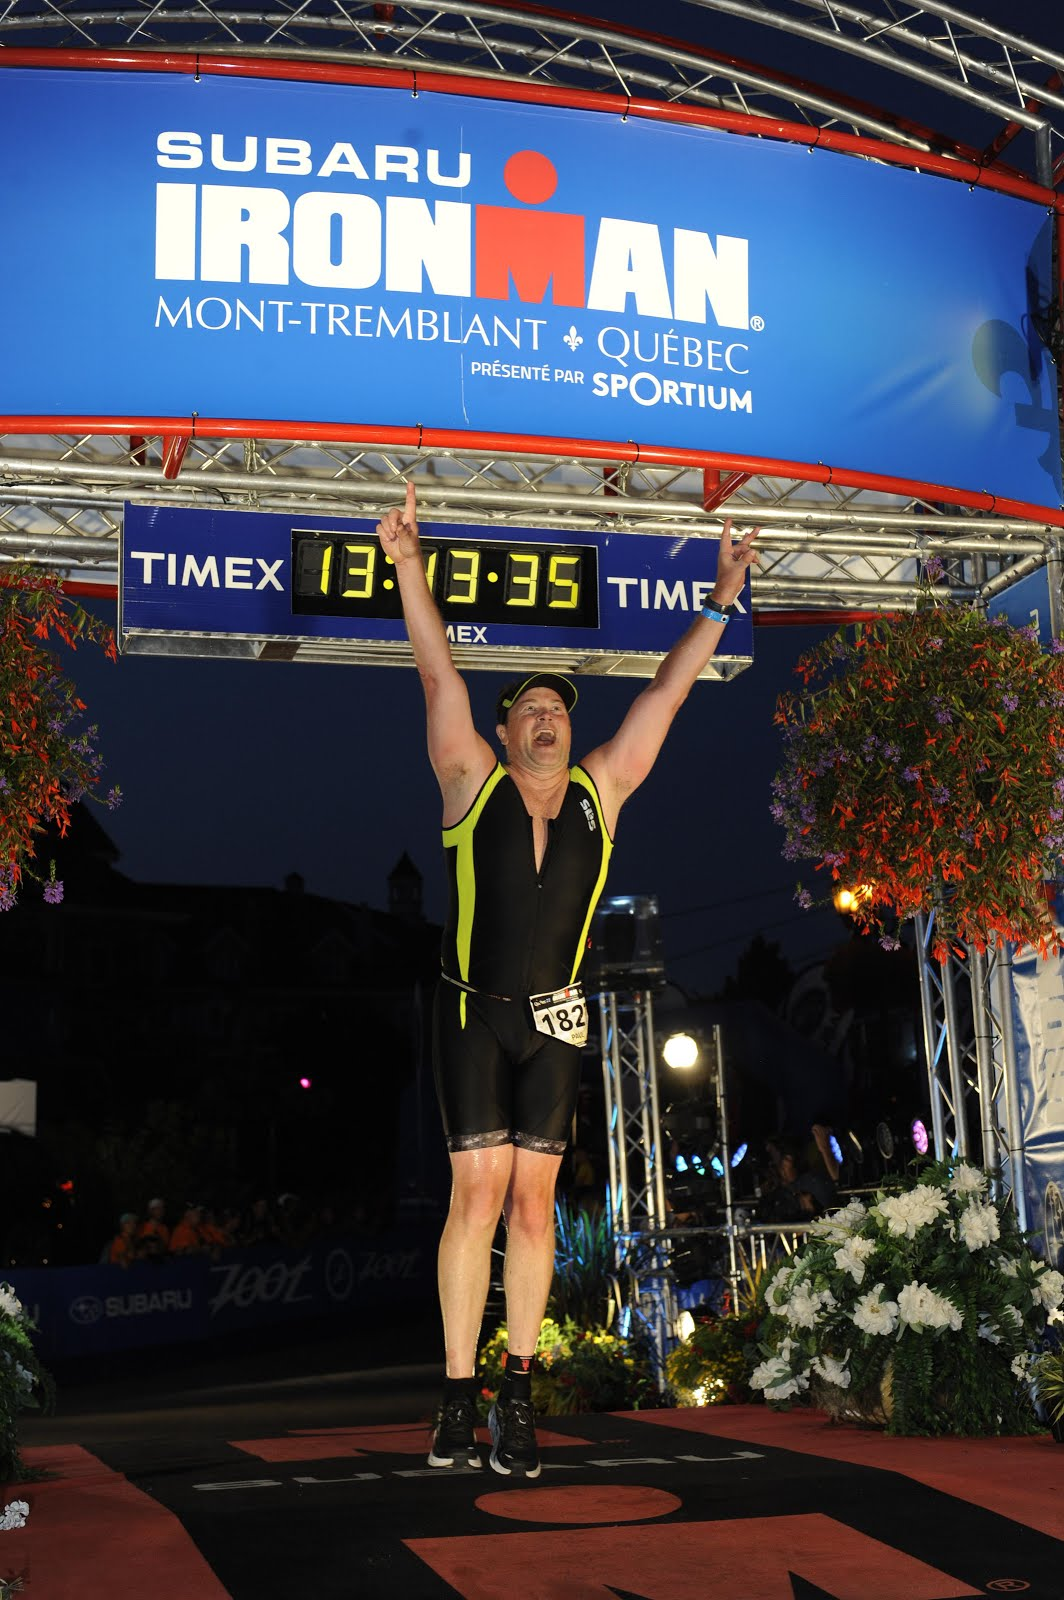 Mont-Tremblant Ironman 2017